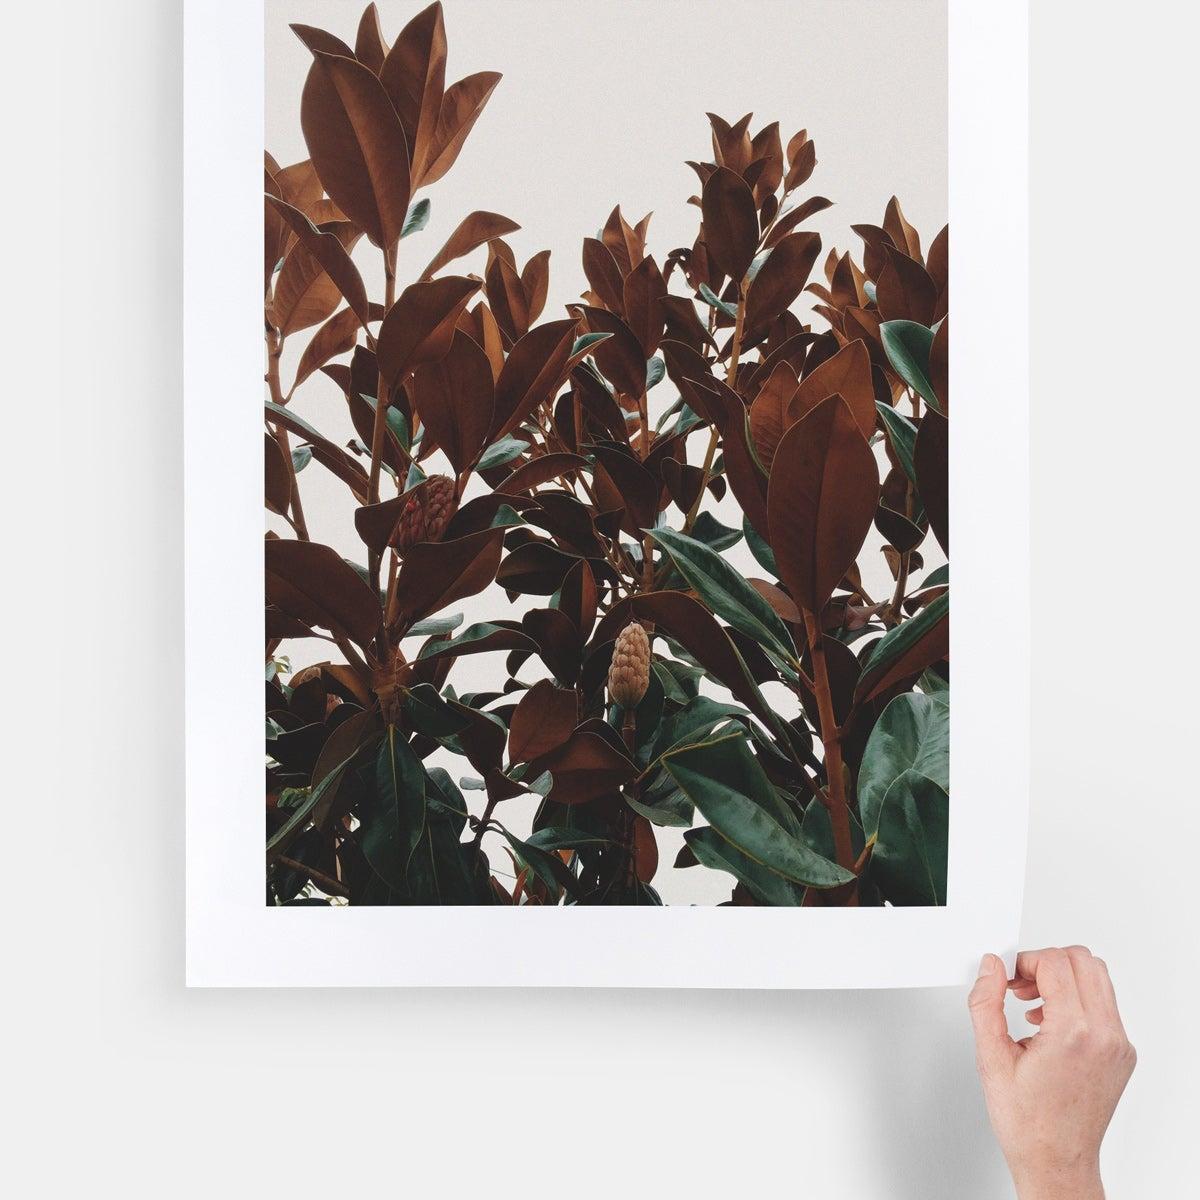 large-format-print-main01-tree-leaves_2x